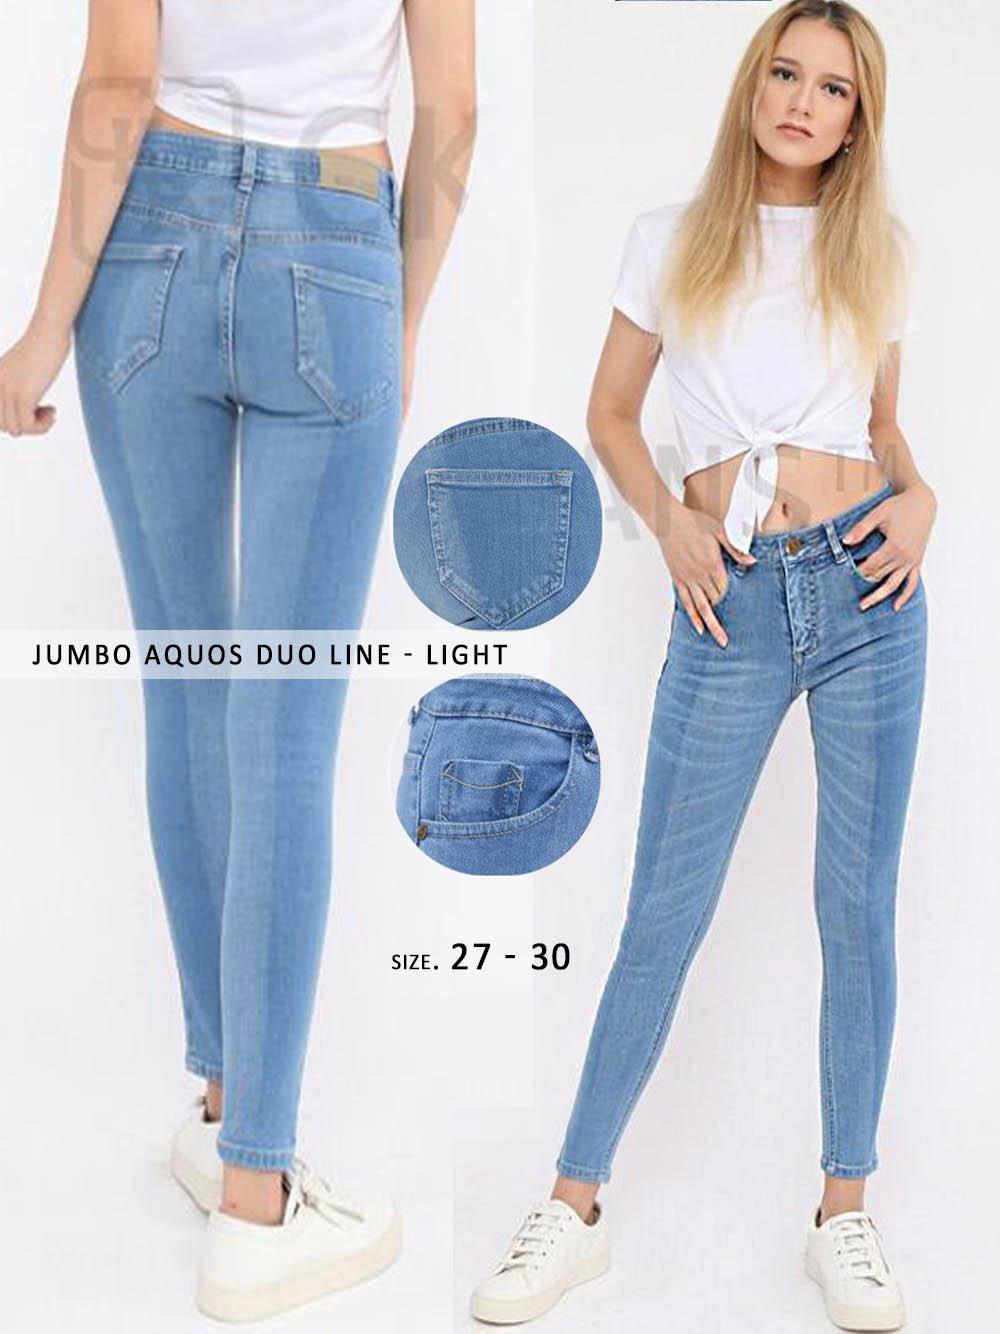 Celana Skinny Jeans Wanita - JUMBO AQUOS DUO LINE GCK 8392122